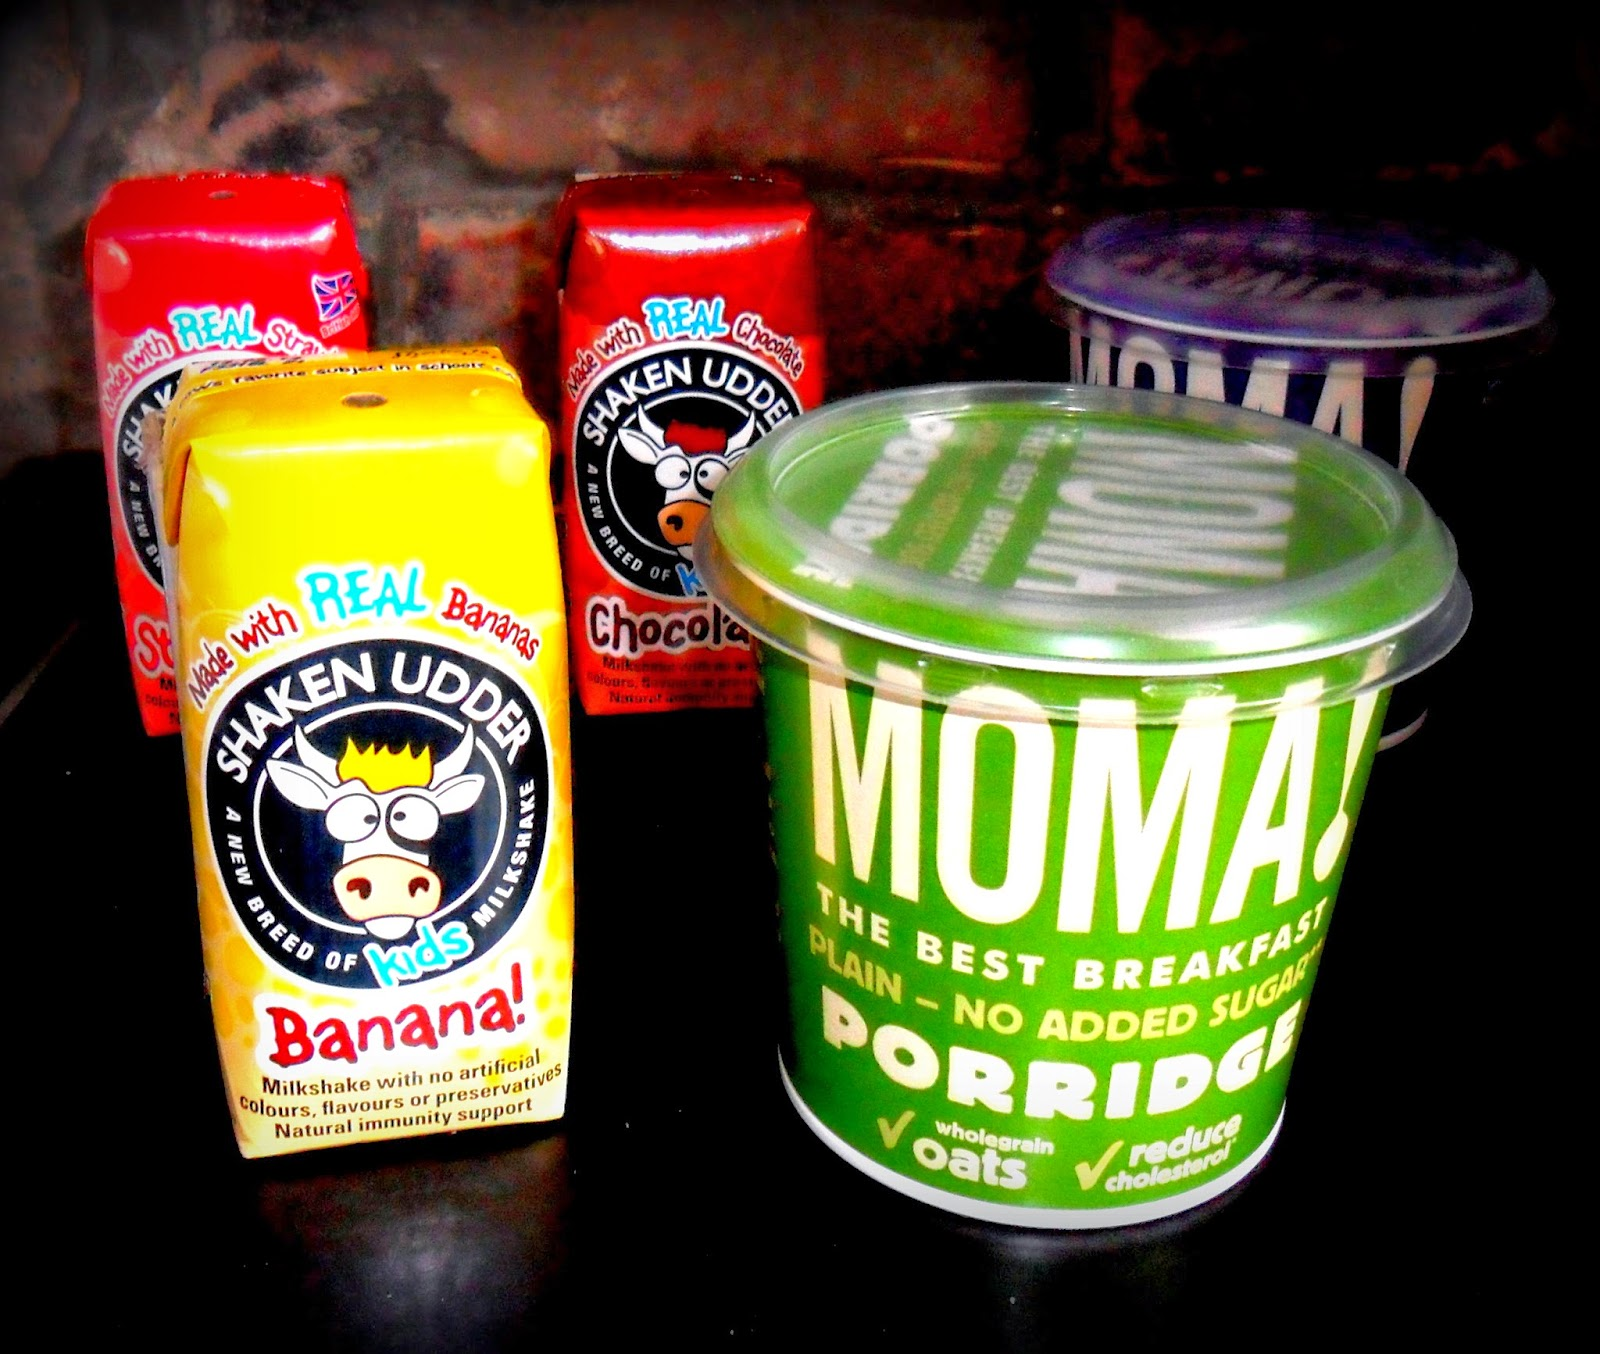 Shaken Udder Milkshakes, Milkshakes, Moma Porridge, Breakfast at Work, Breakfast